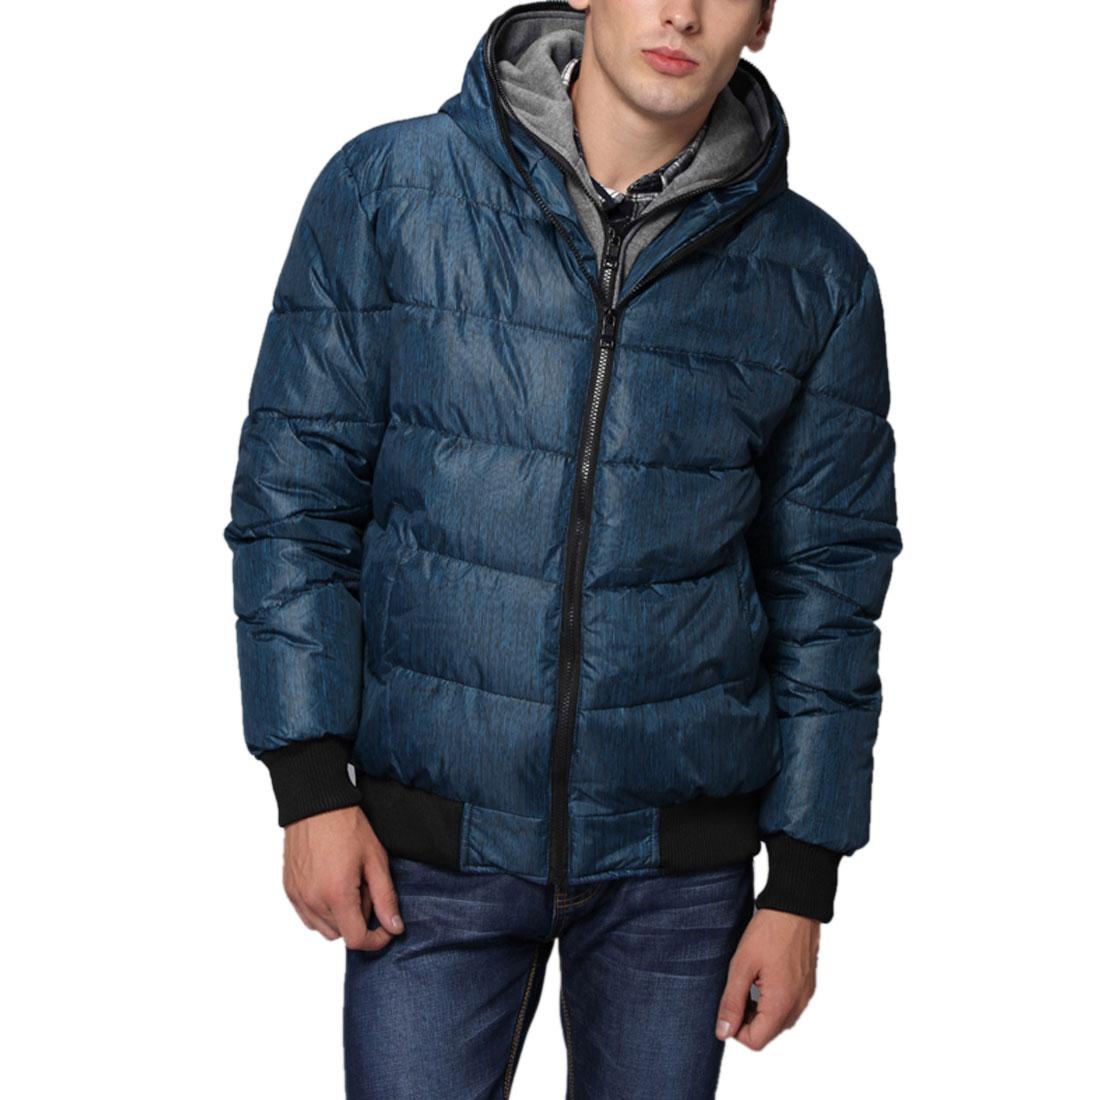 Men Blue Black Hooded Side Pockets Long Sleeves Winter Padded Coat M